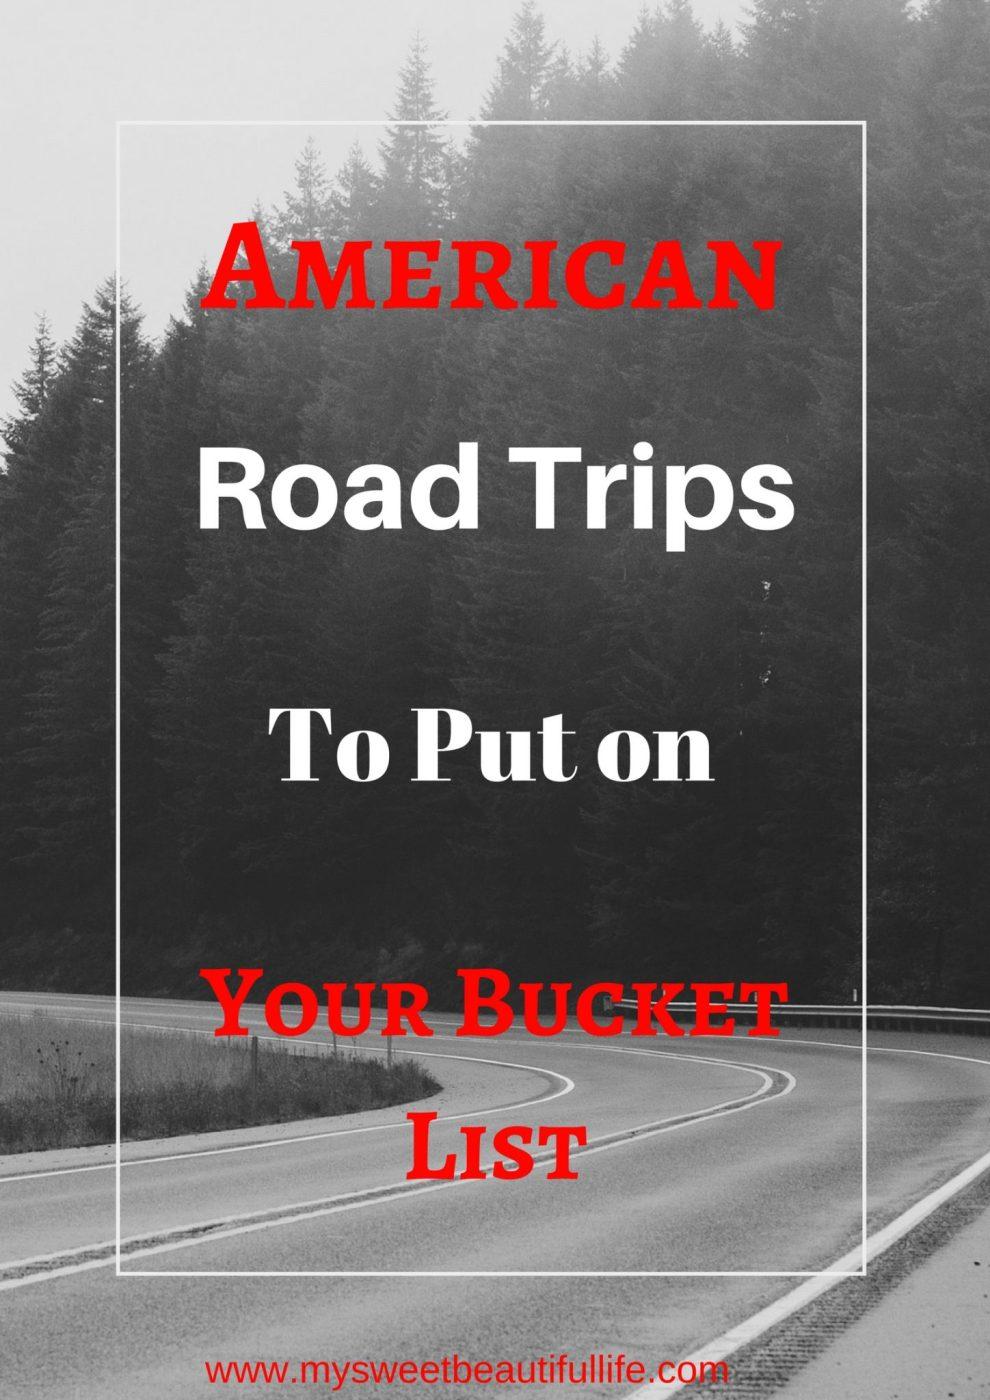 American Road Trips to Take #trips #roadtrips #travel #cartravel #roads #bucketlist #vacations #openroad